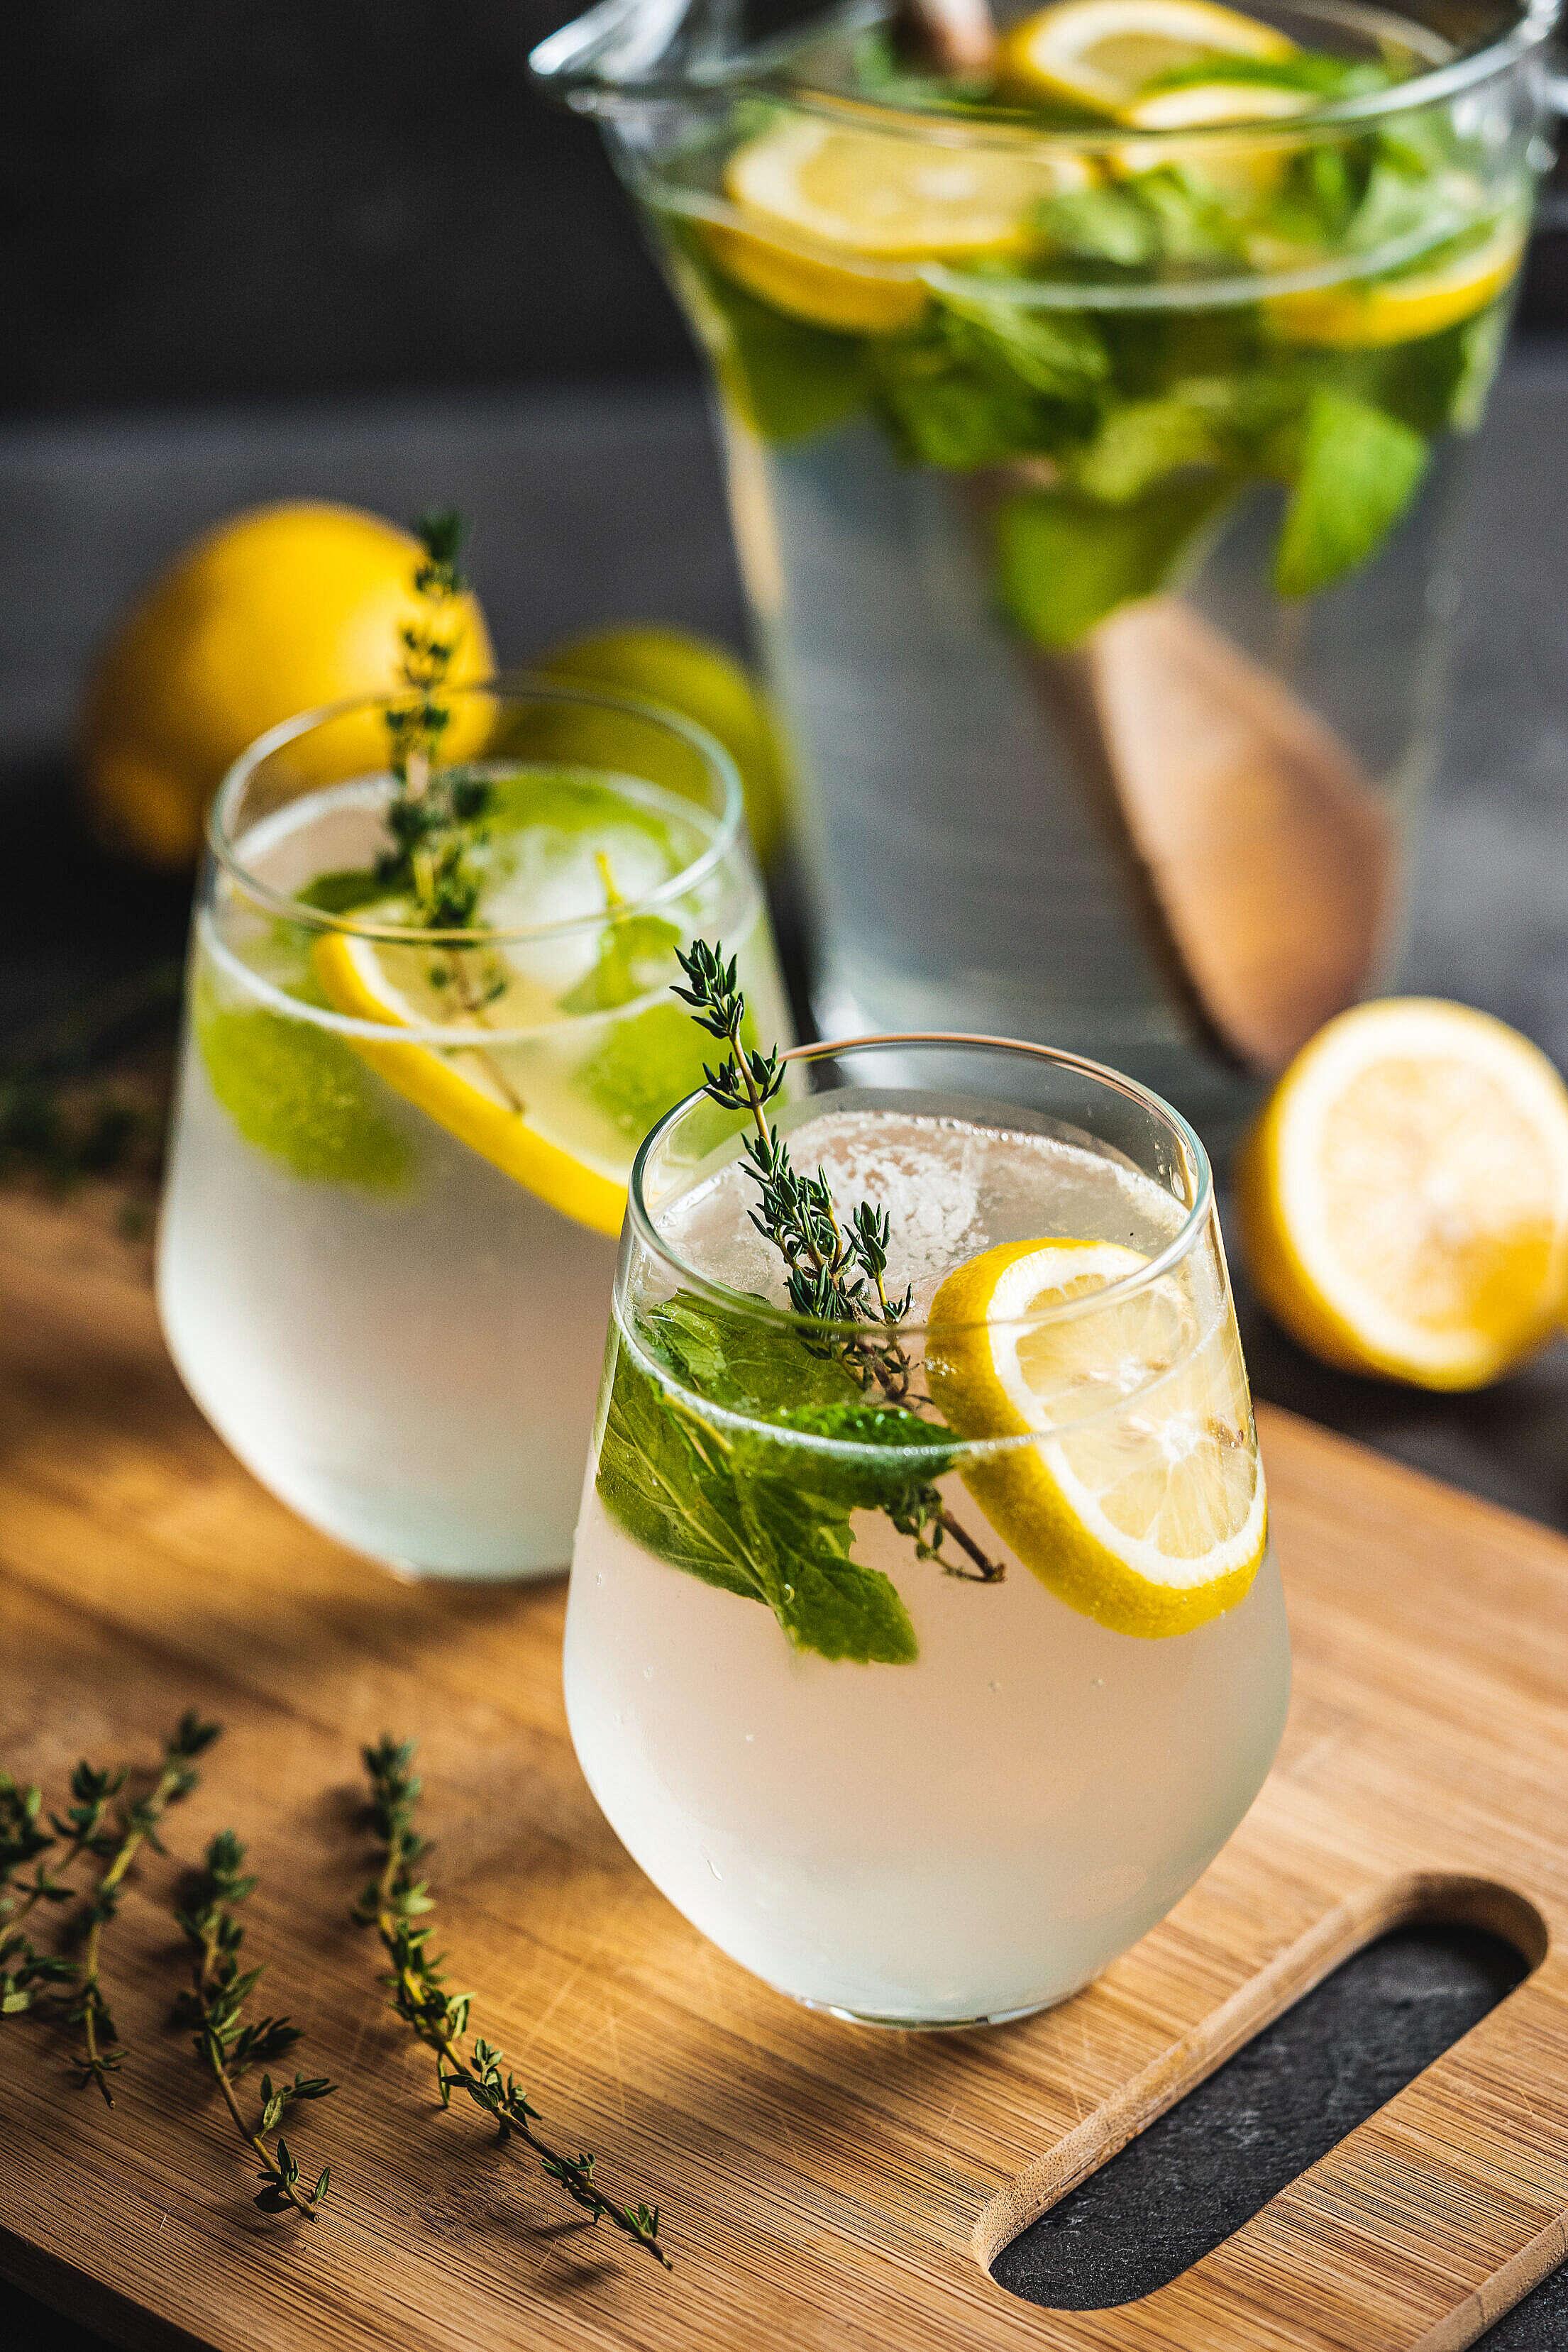 Homemade Lemon Drinks Free Stock Photo